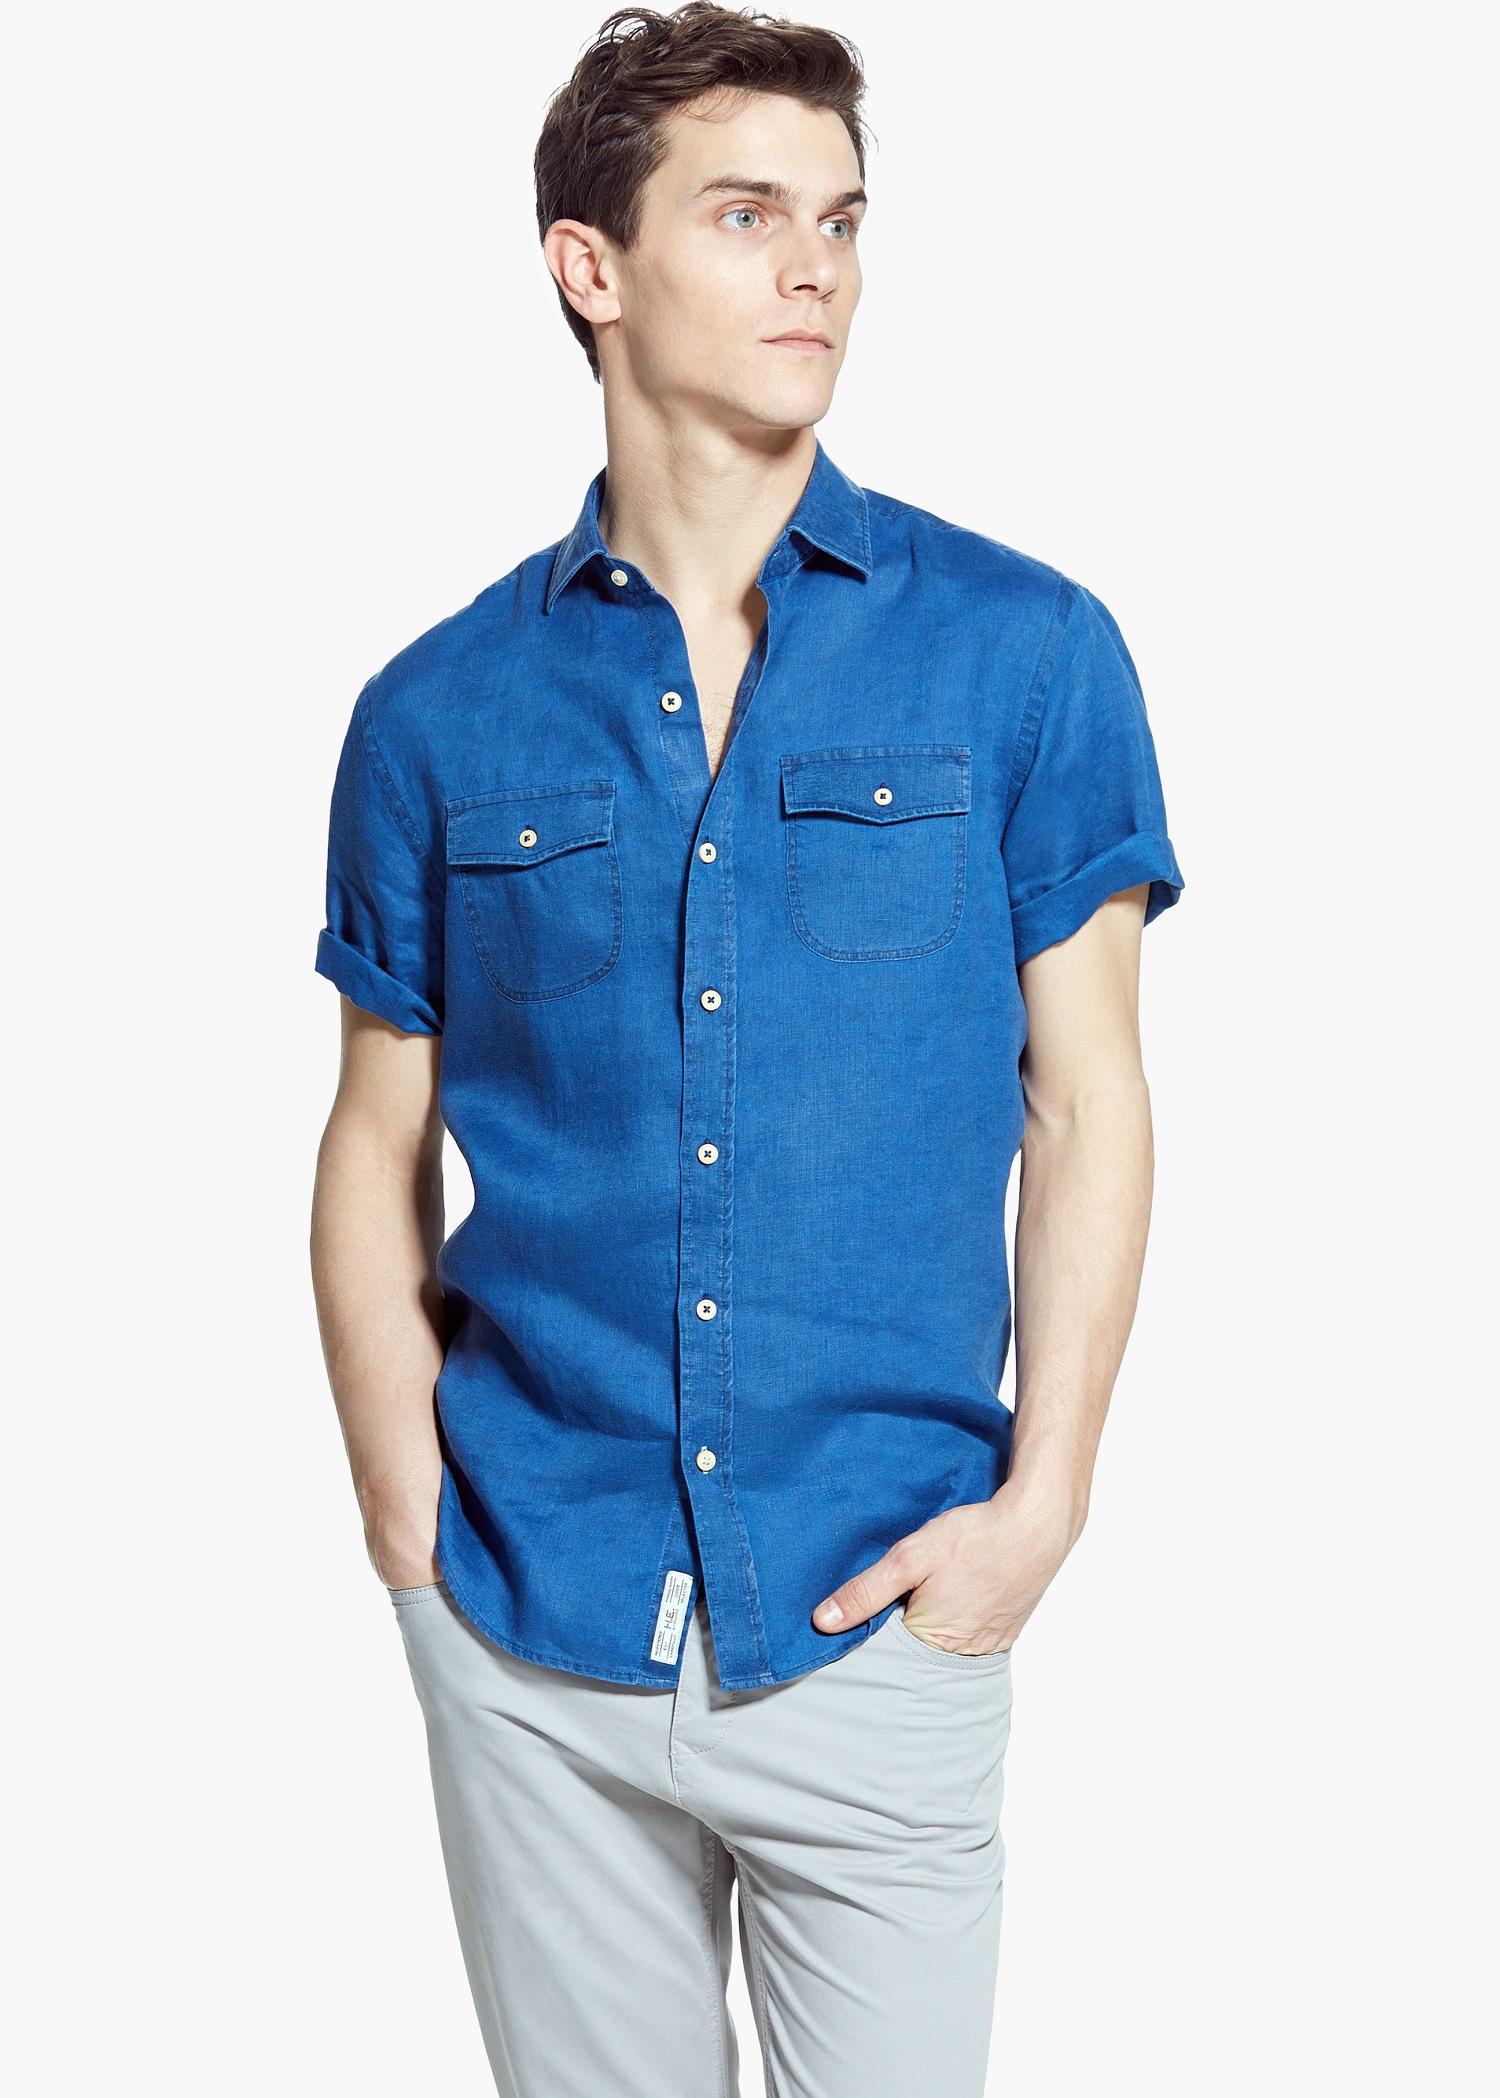 ab58f74bcdbf Mango Slim-Fit Short-Sleeve Linen Shirt in Blue for Men - Lyst